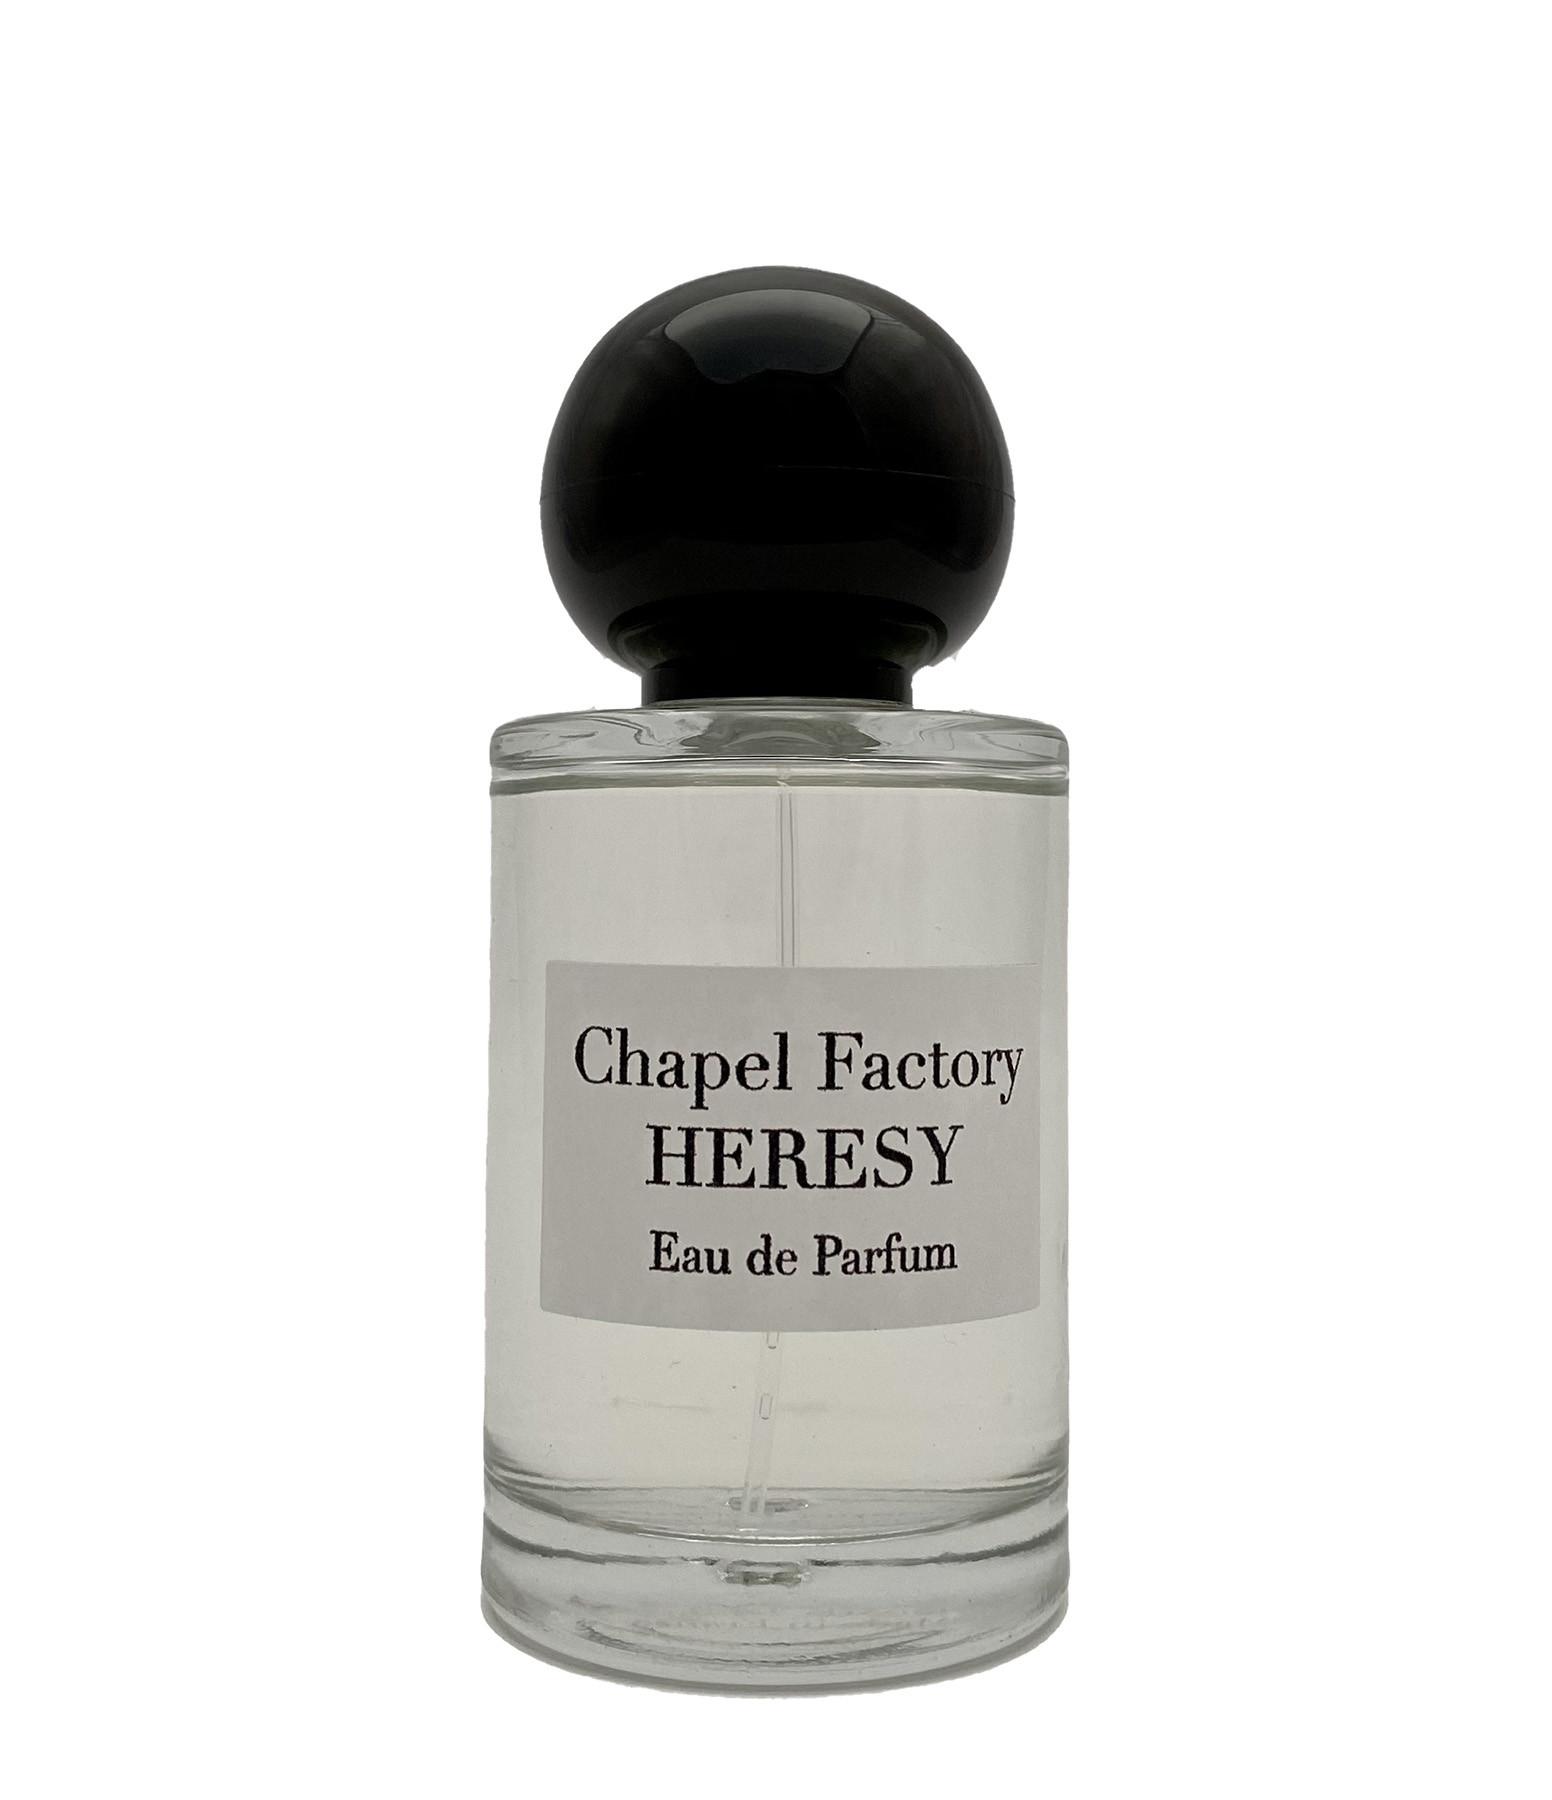 CHAPEL FACTORY - Eau de Parfum Heresy 100ml